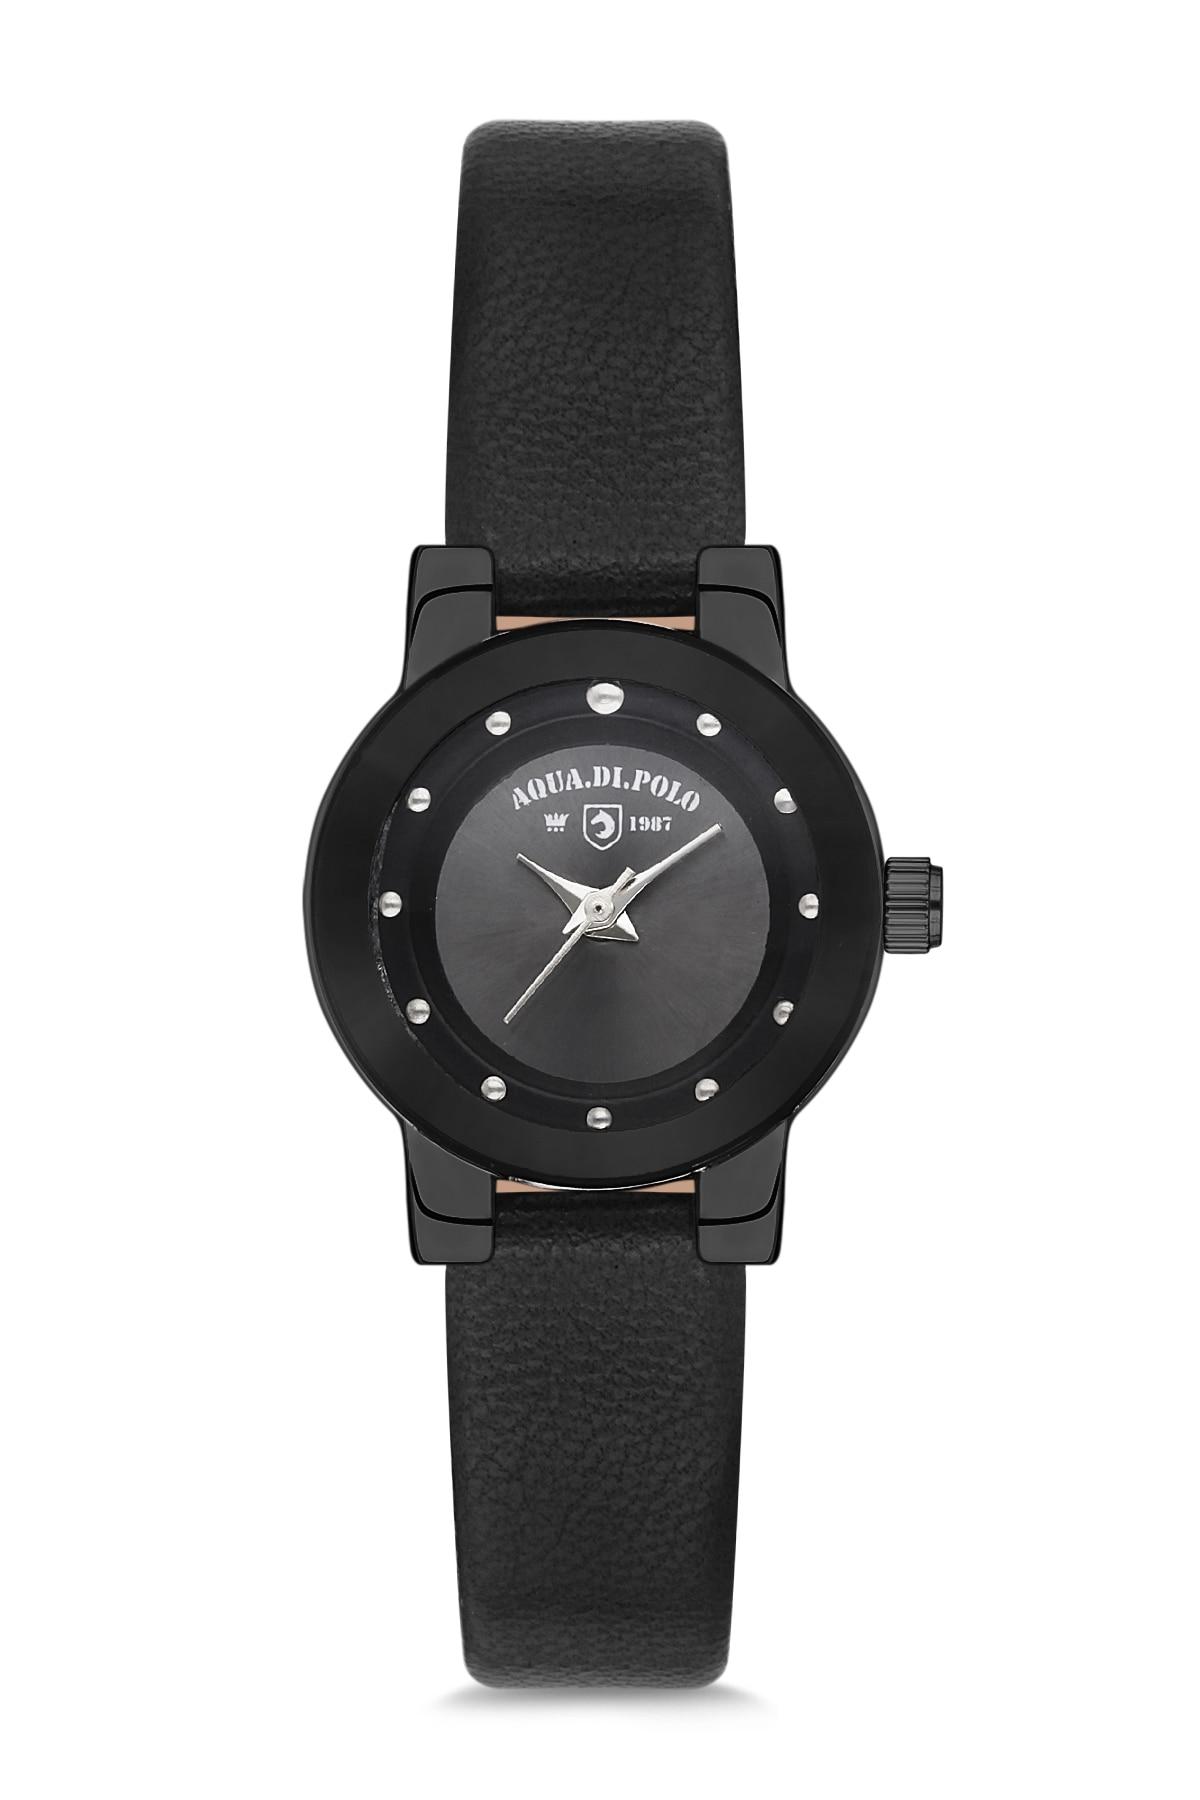 Aqua Di Polo APSV1-A9416-ED333 Leather Women Wrist Watch